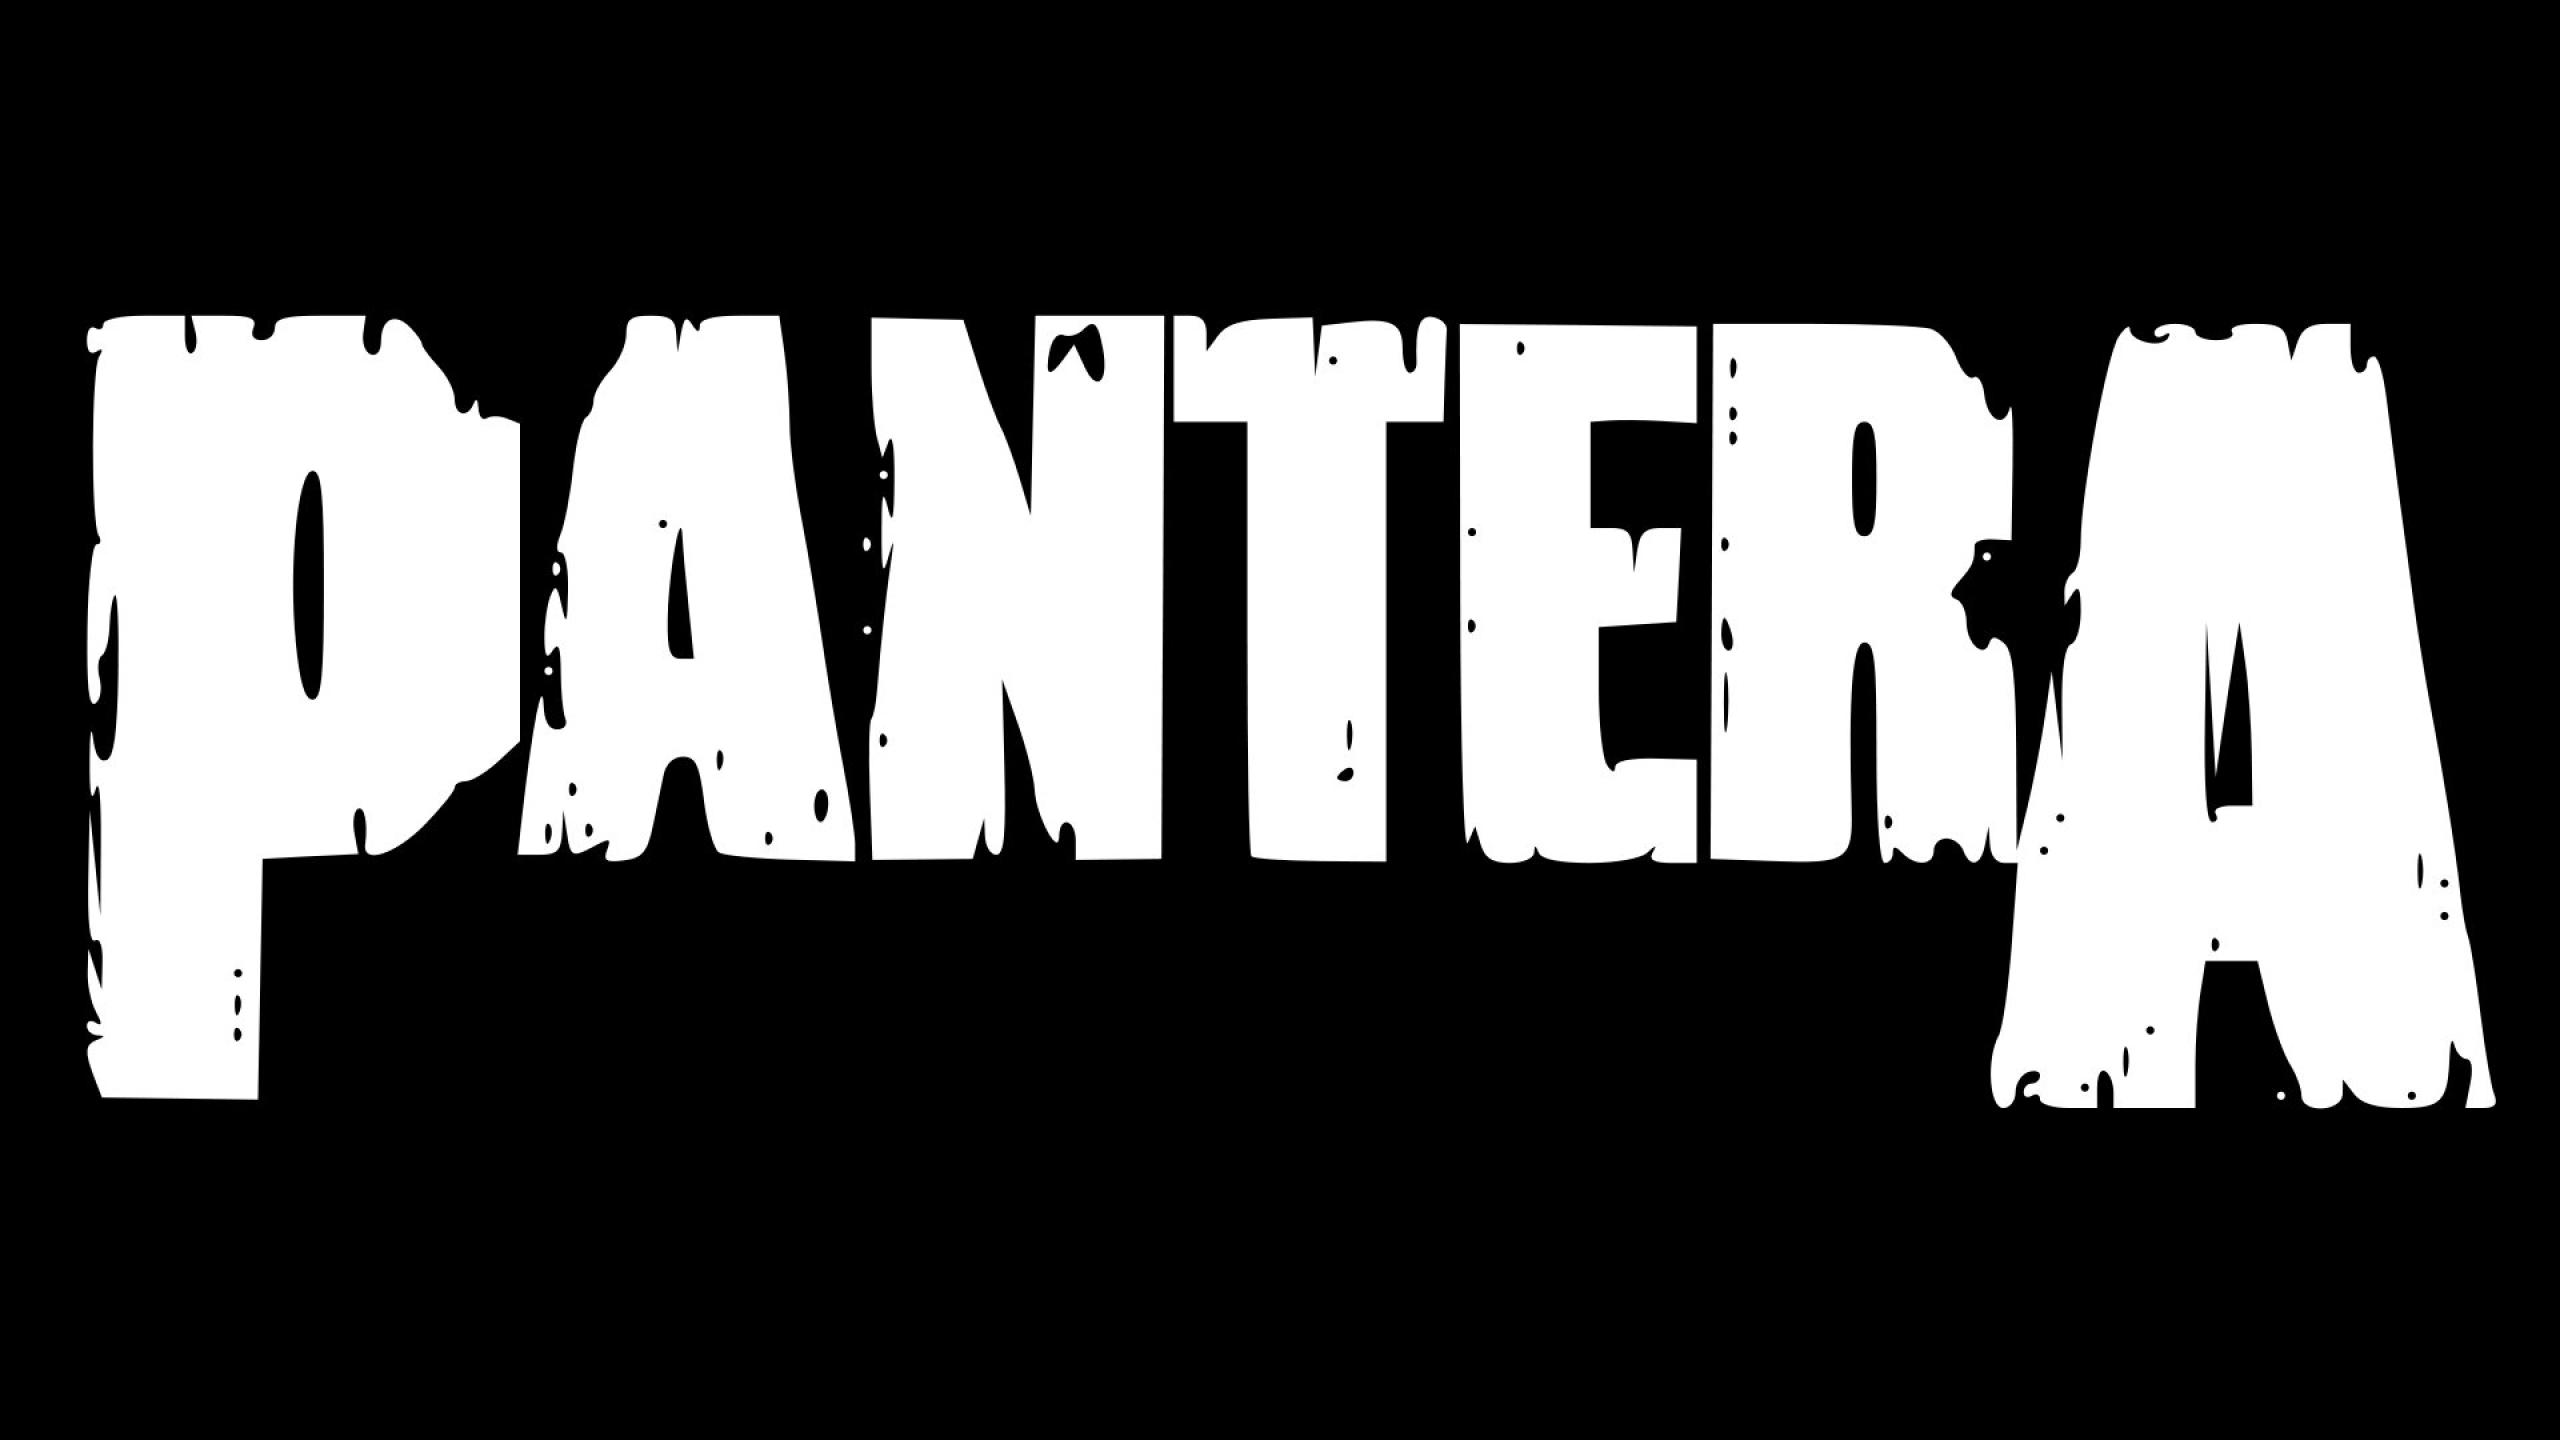 2560x1440 Pantera Name Font 1440p Resolution Wallpaper Hd